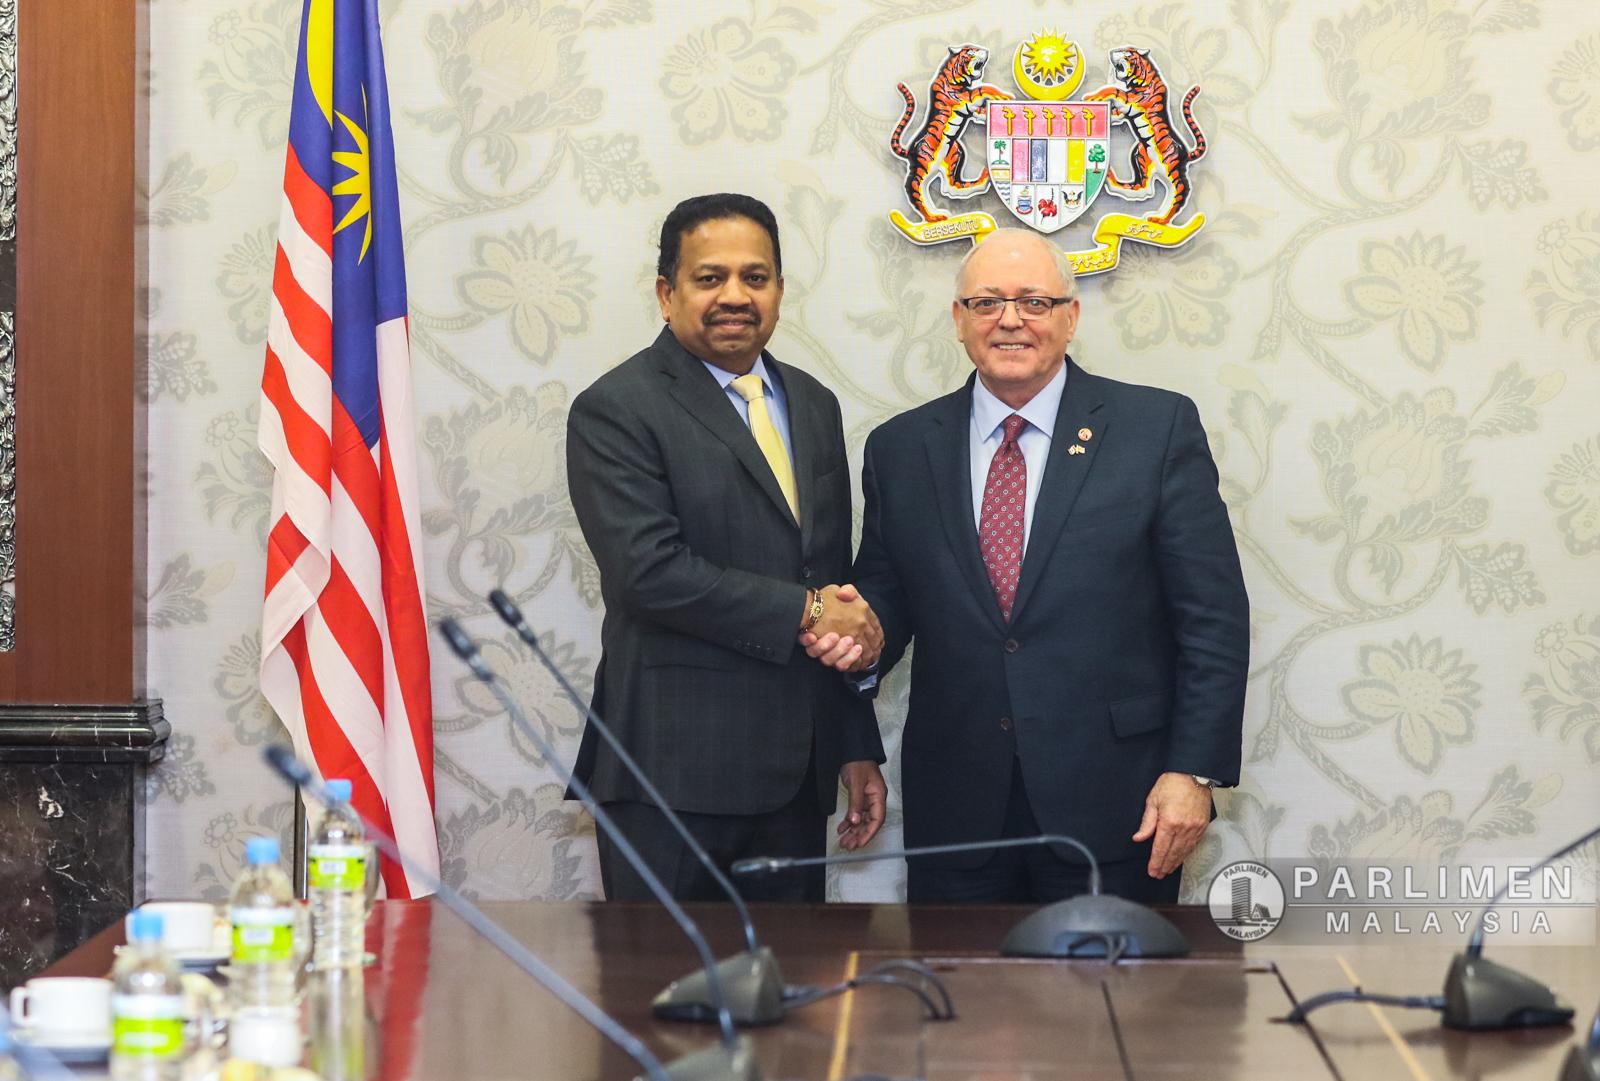 kunjungan-hormat-h-e-george-j-furey-speaker-of-the-senate-of-canada-to-malaysia